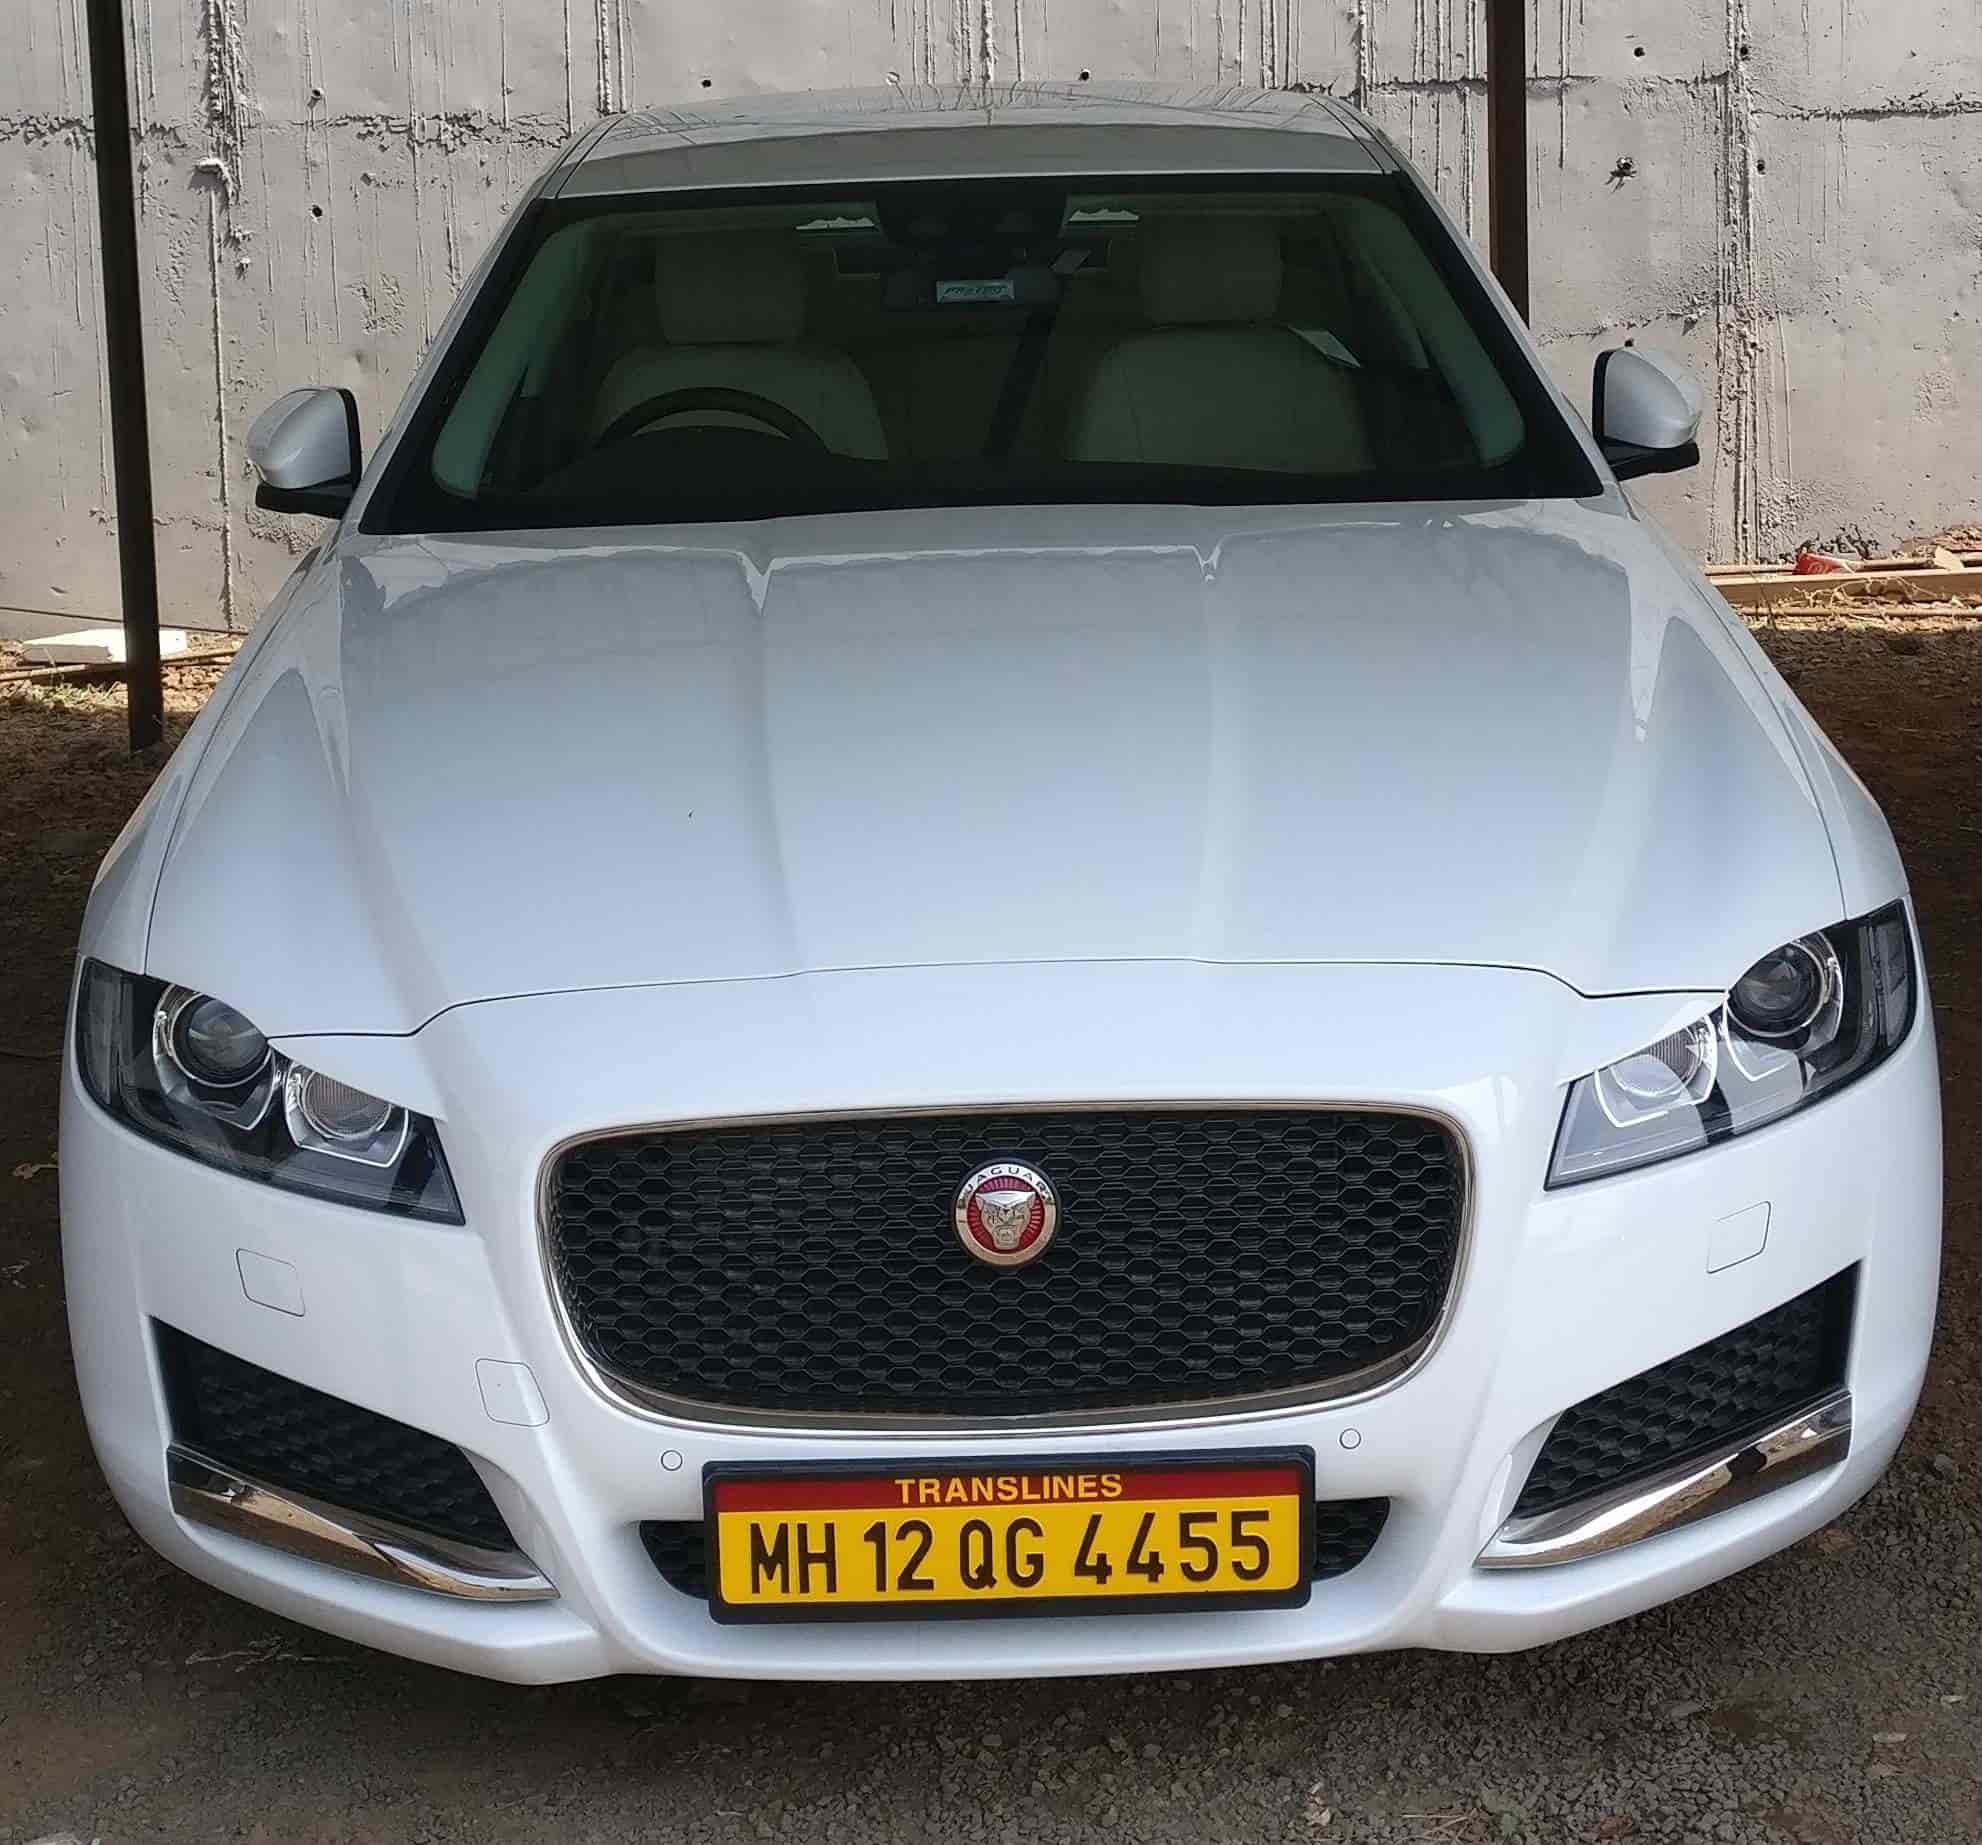 Translines Luxury Car Rentals Photos Lohegaon Pune Pictures